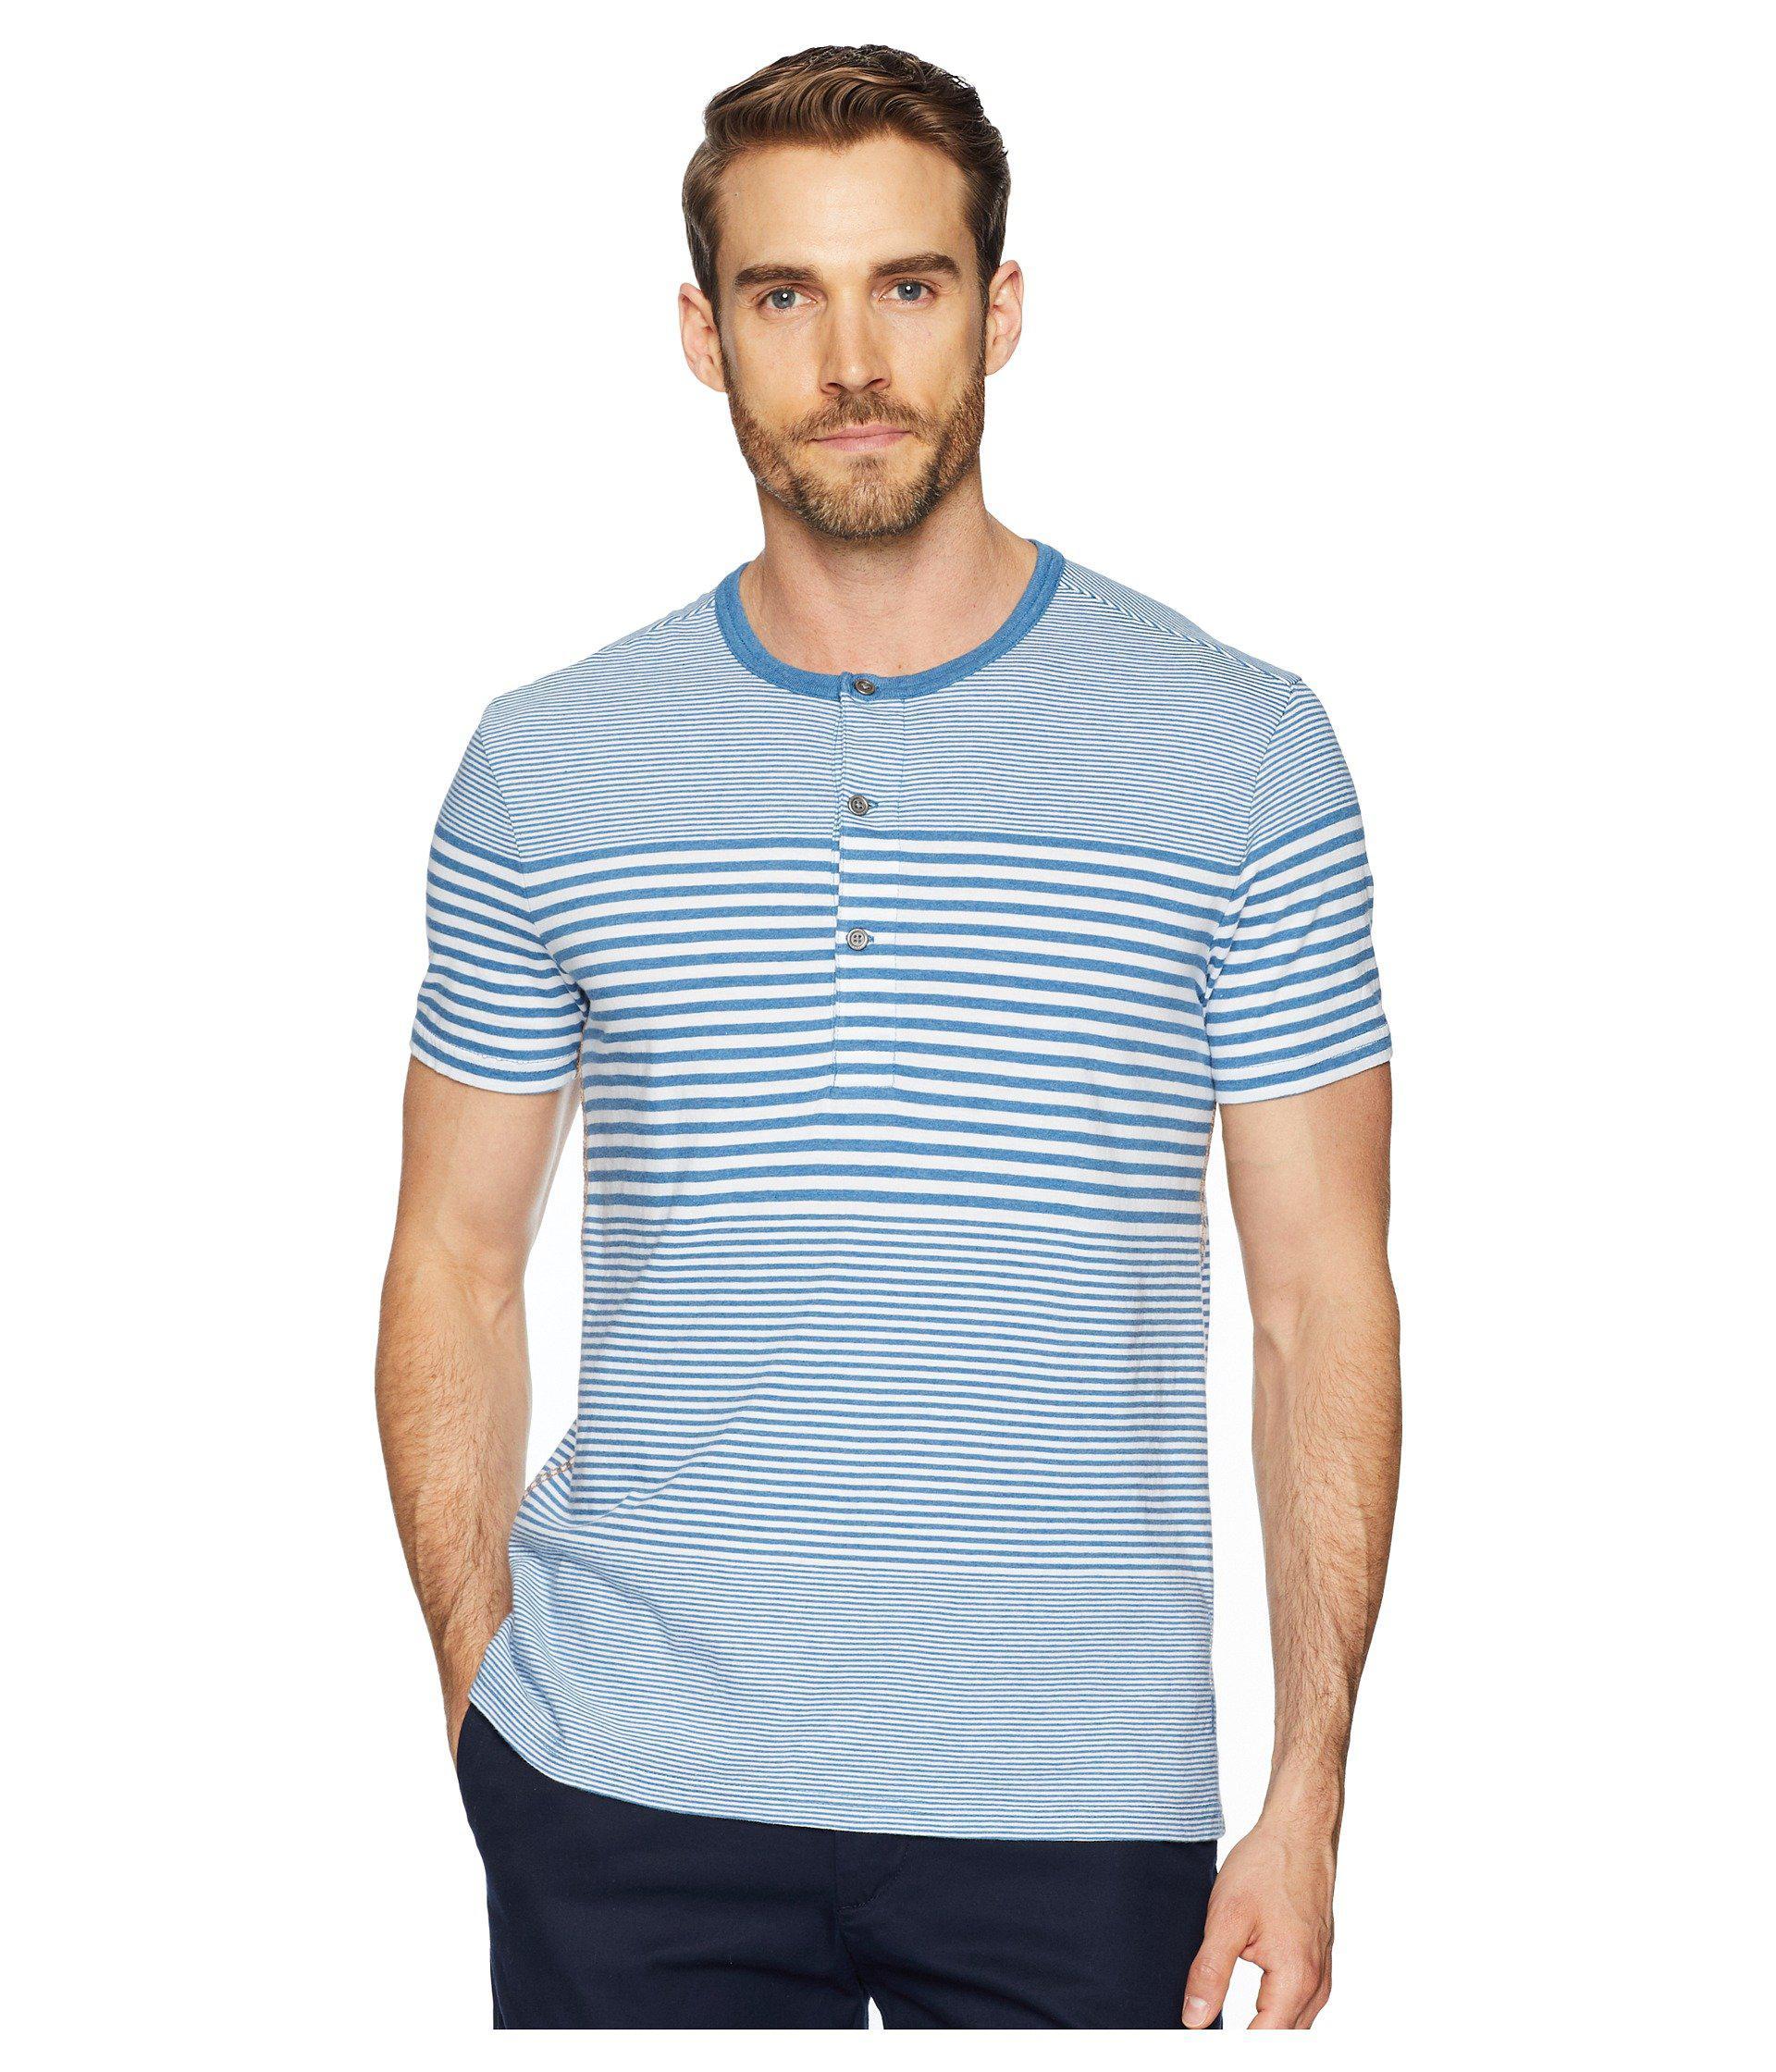 7d95f1c2 Lyst - Calvin Klein Short Sleeve Striped Henley in Blue for Men ...